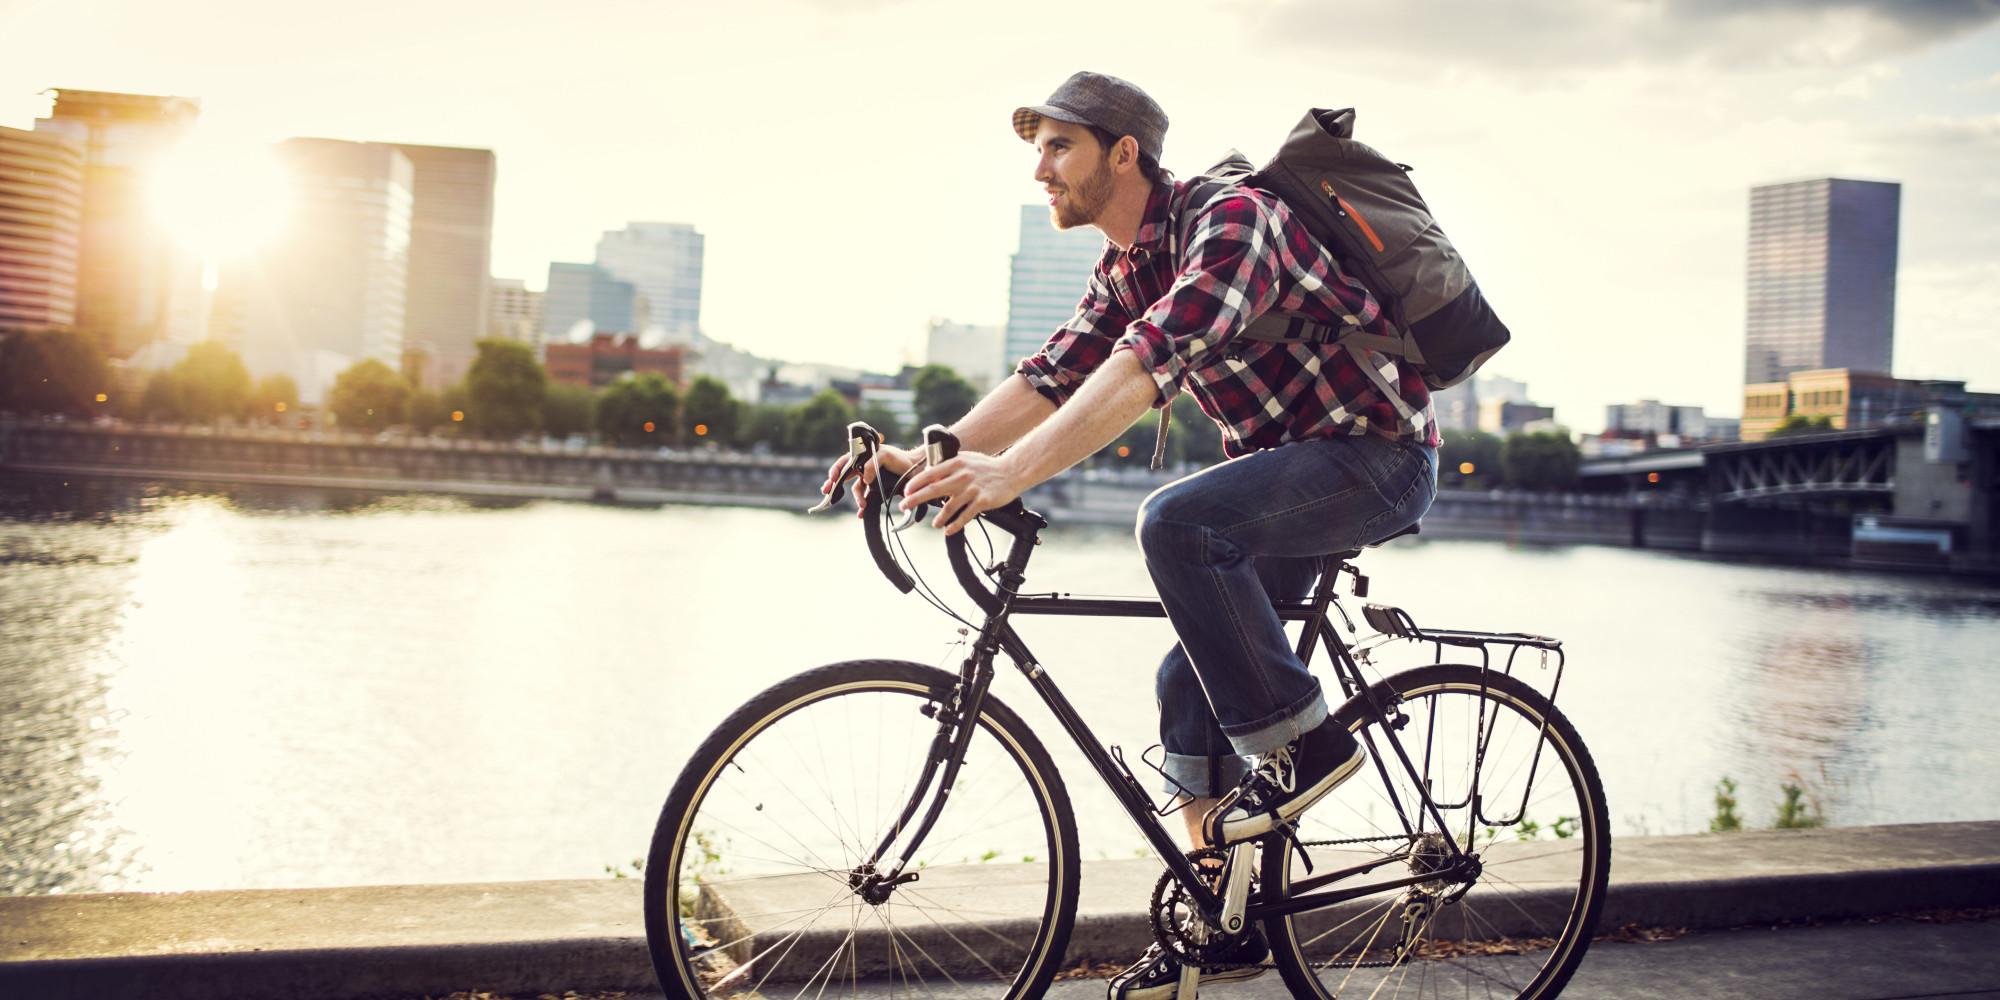 o-bicycle-city-facebook.jpg